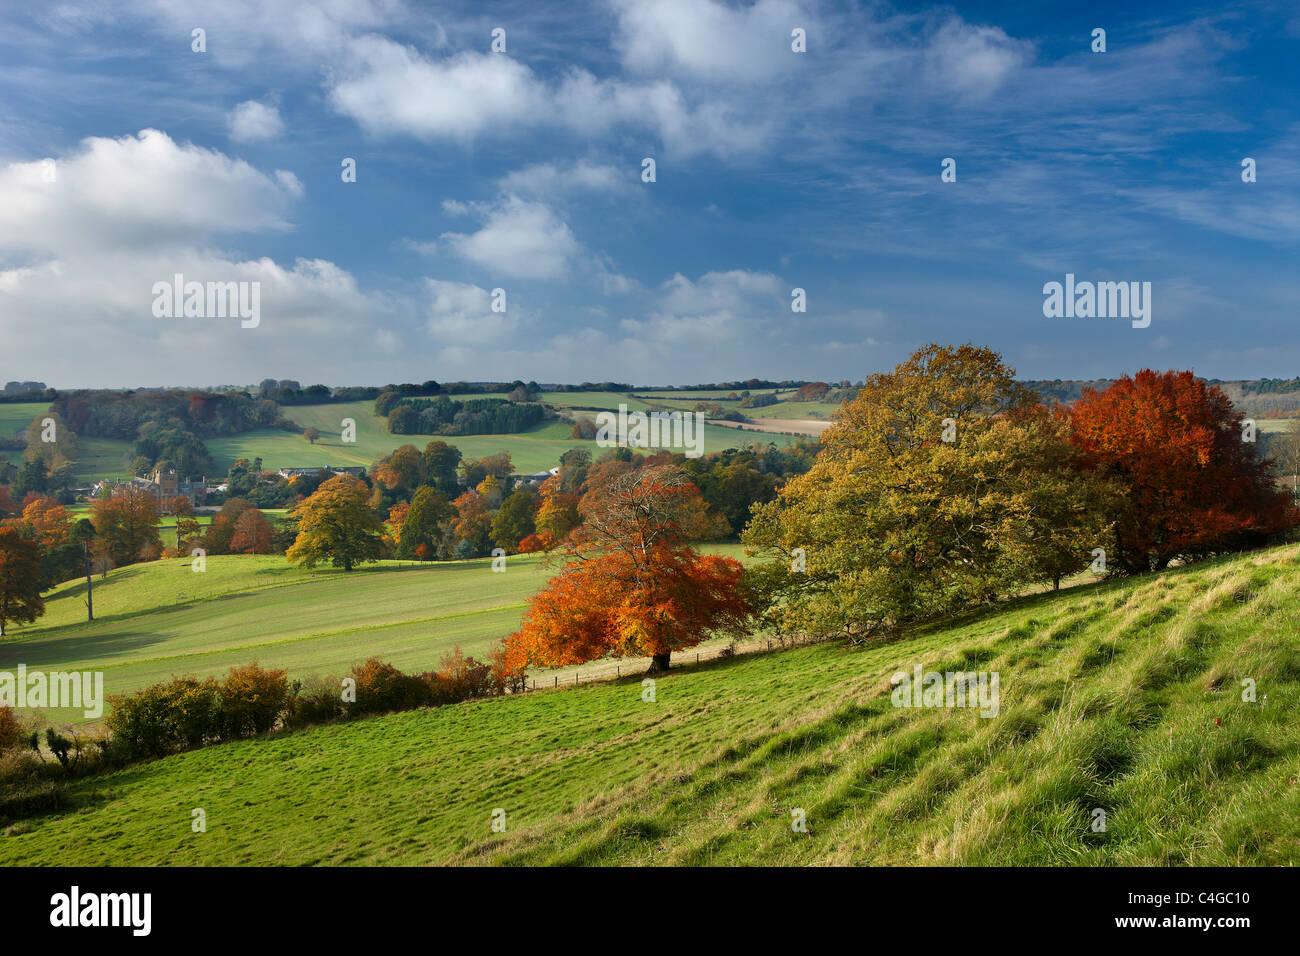 Minterne Magna, Dorset, England - Stock Image